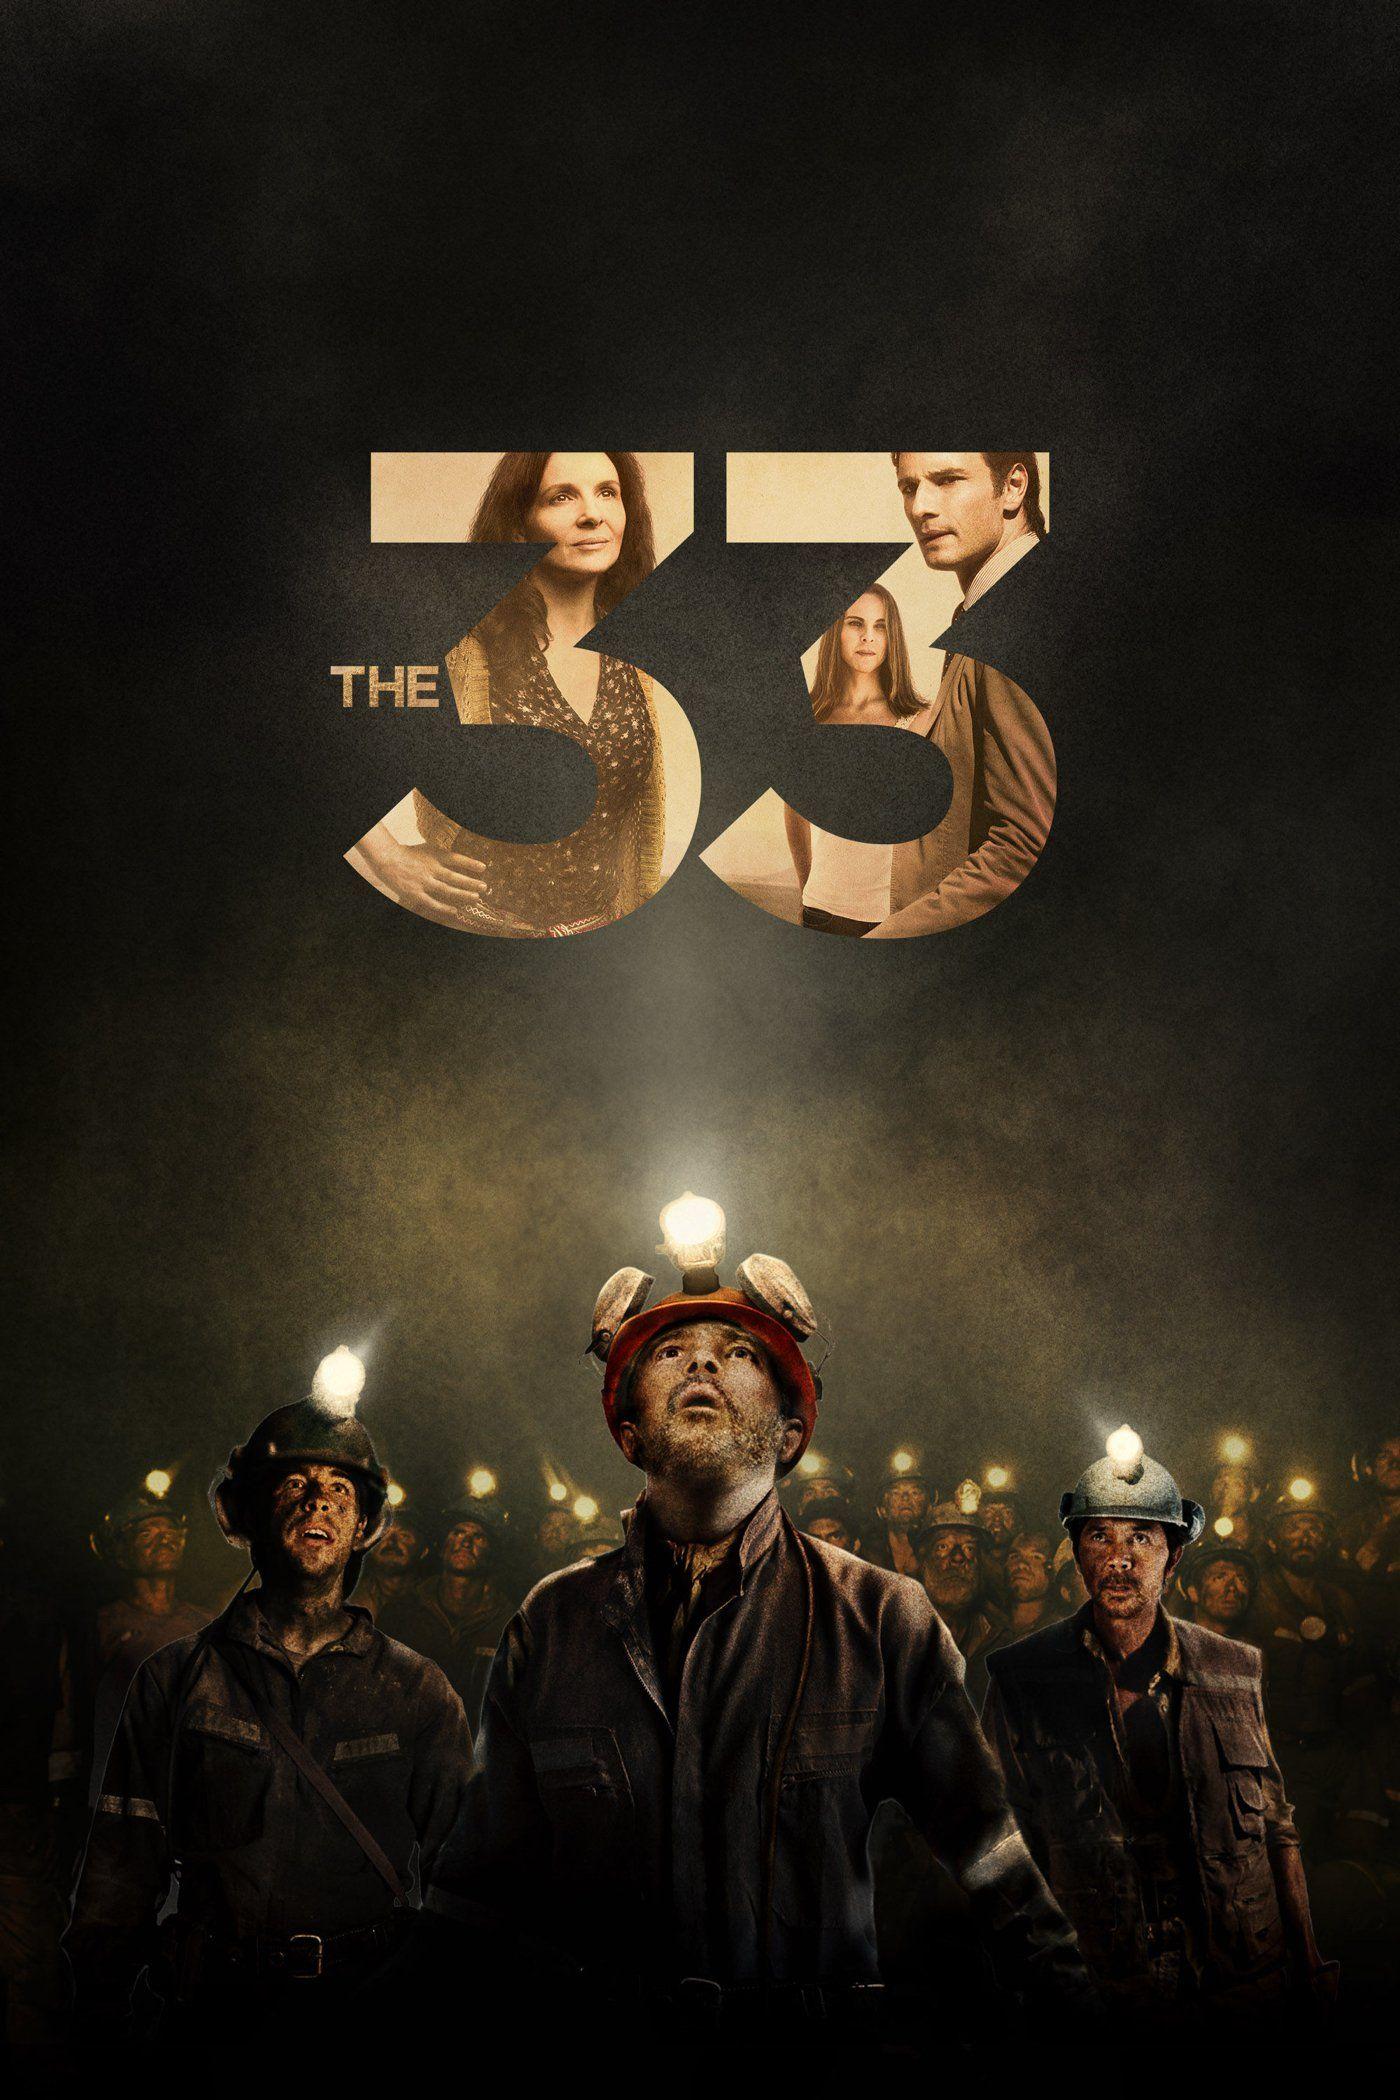 Watch The 33 Full Hd Movie Online Hd Movies Tv Series Online